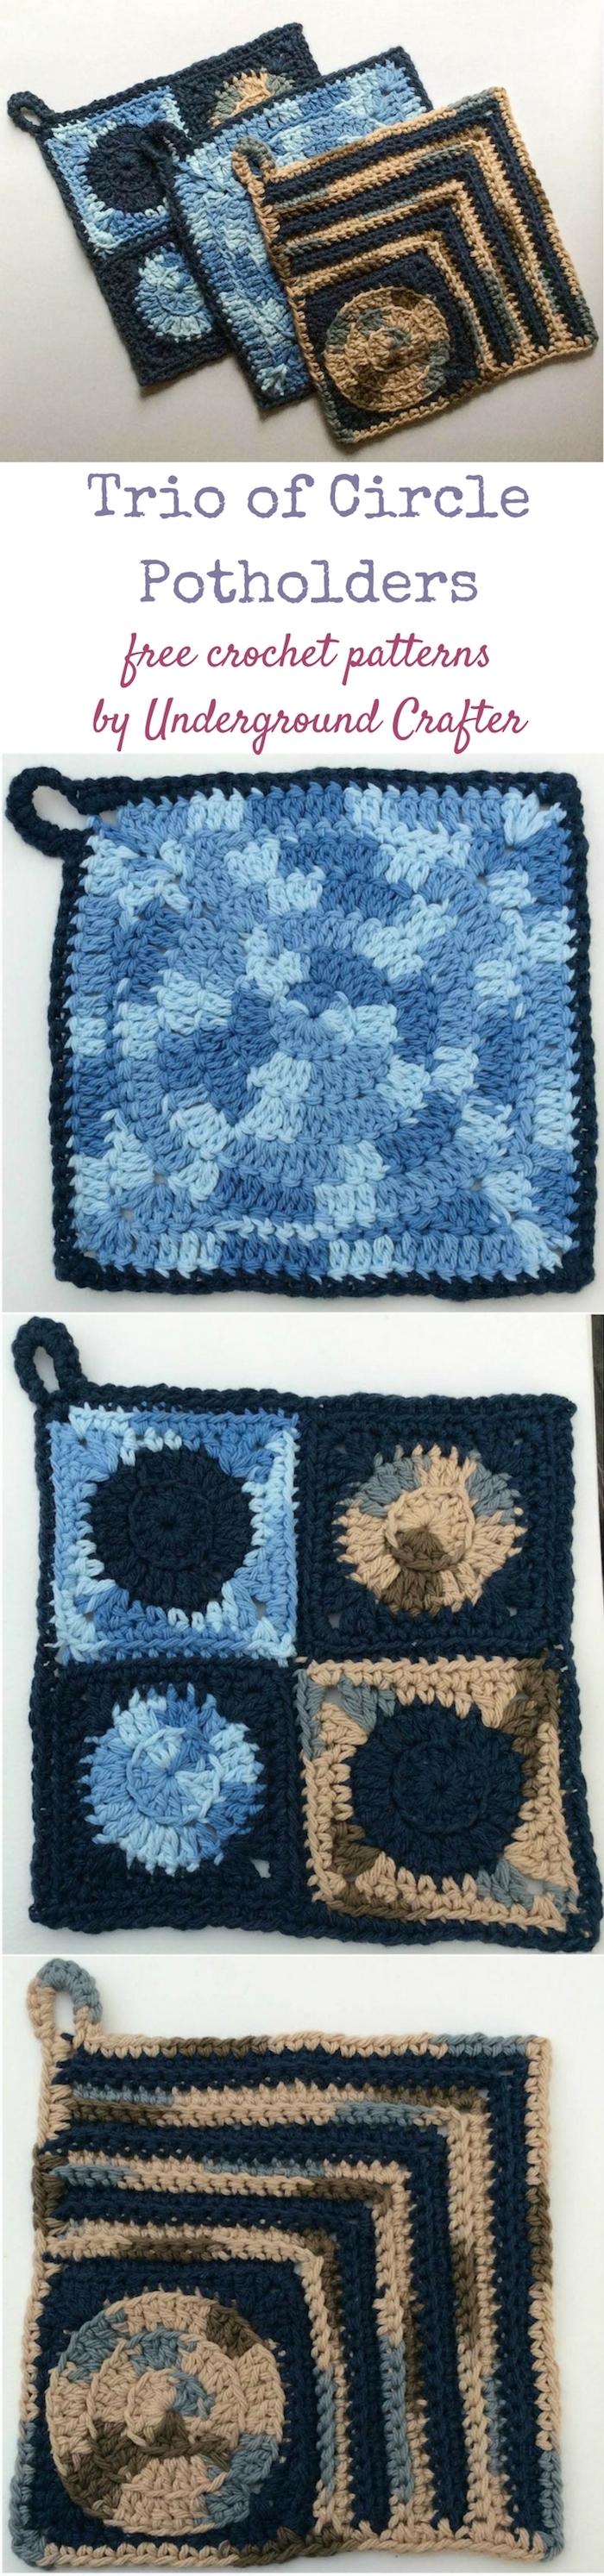 Crochet Patterns Trio Of Circle Potholders Underground Crafter